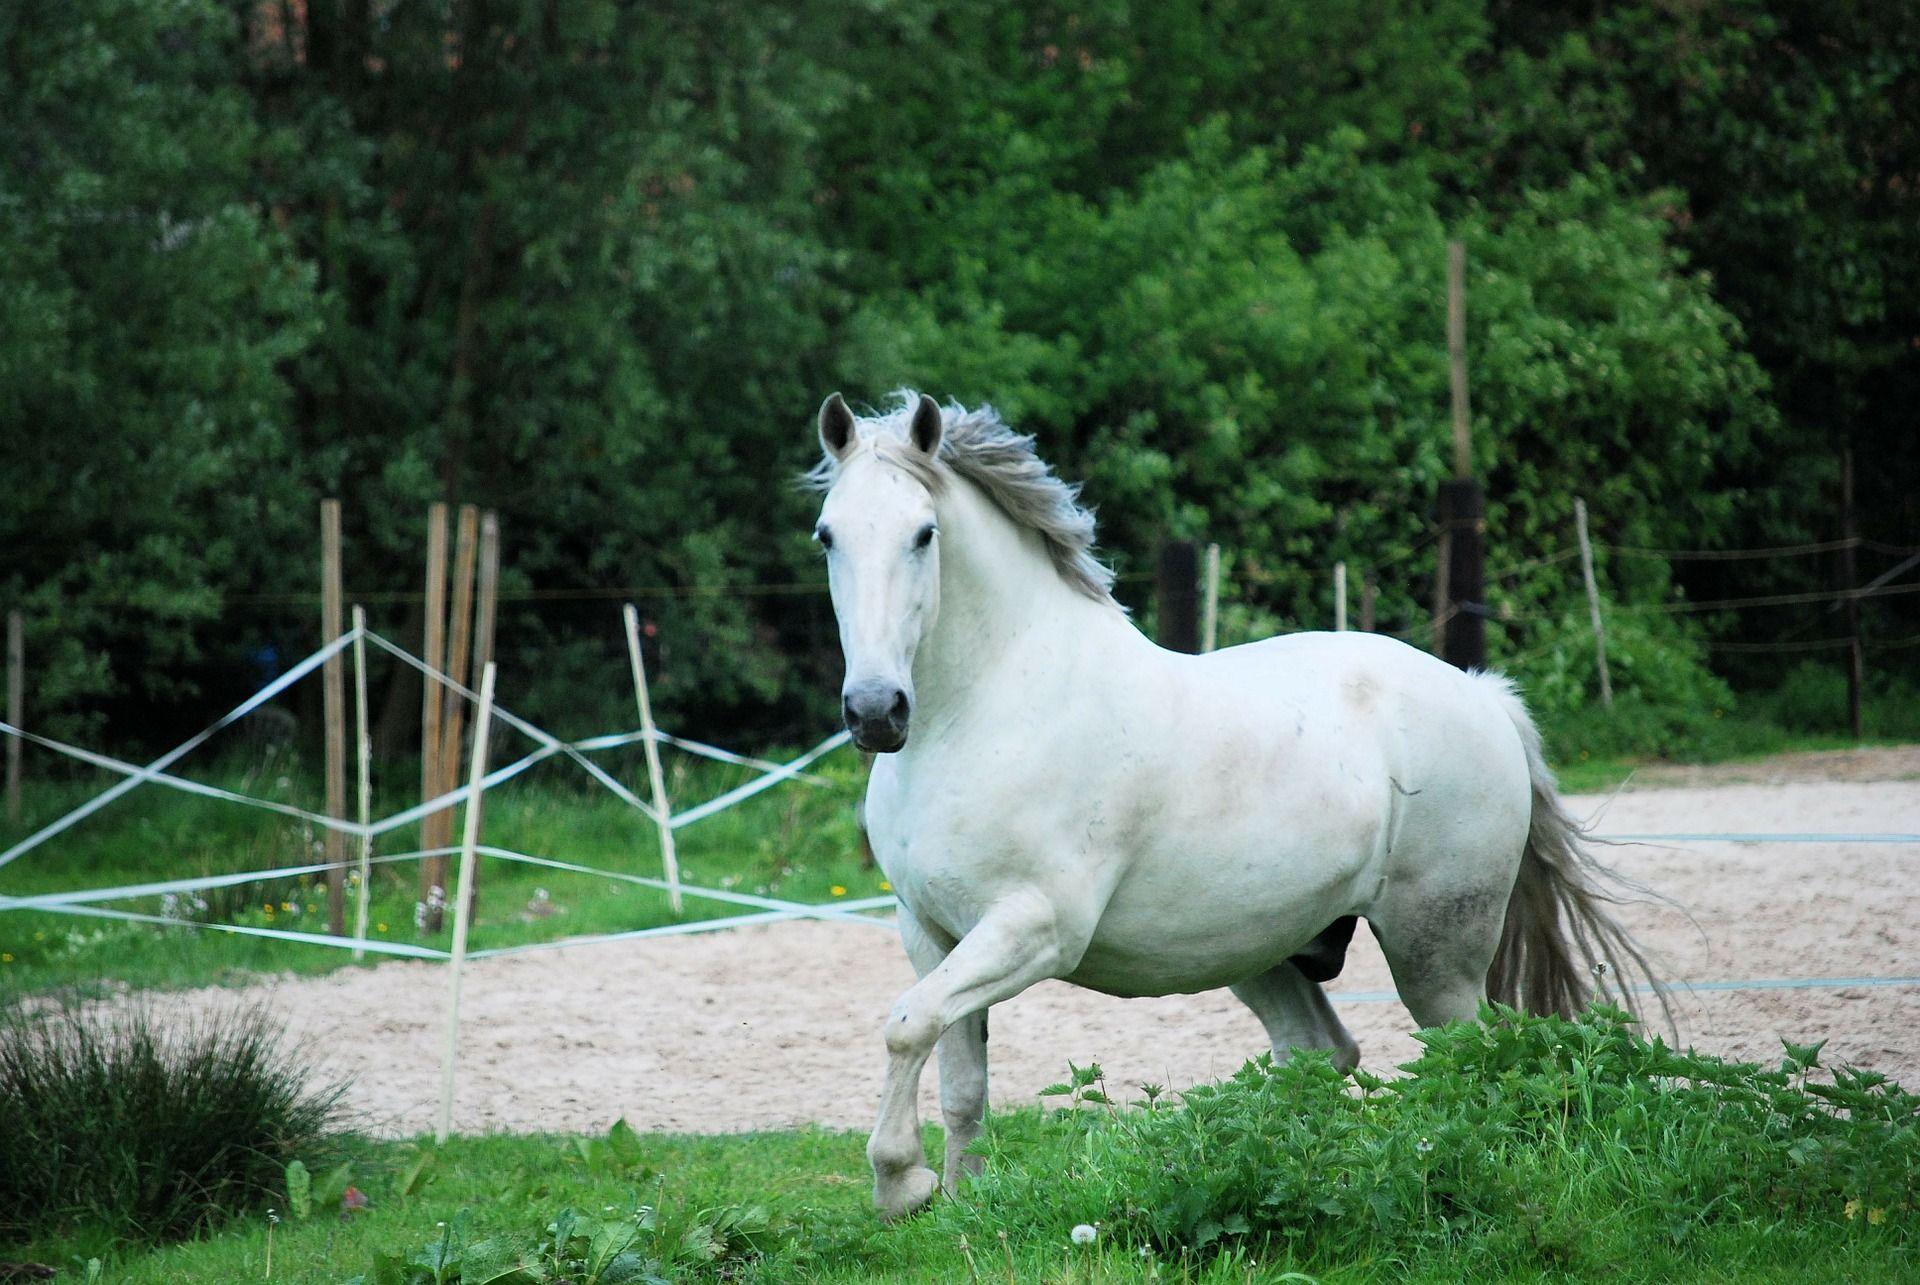 White Horses Running Through Water Or Sea White Horses Horses White Horses Running